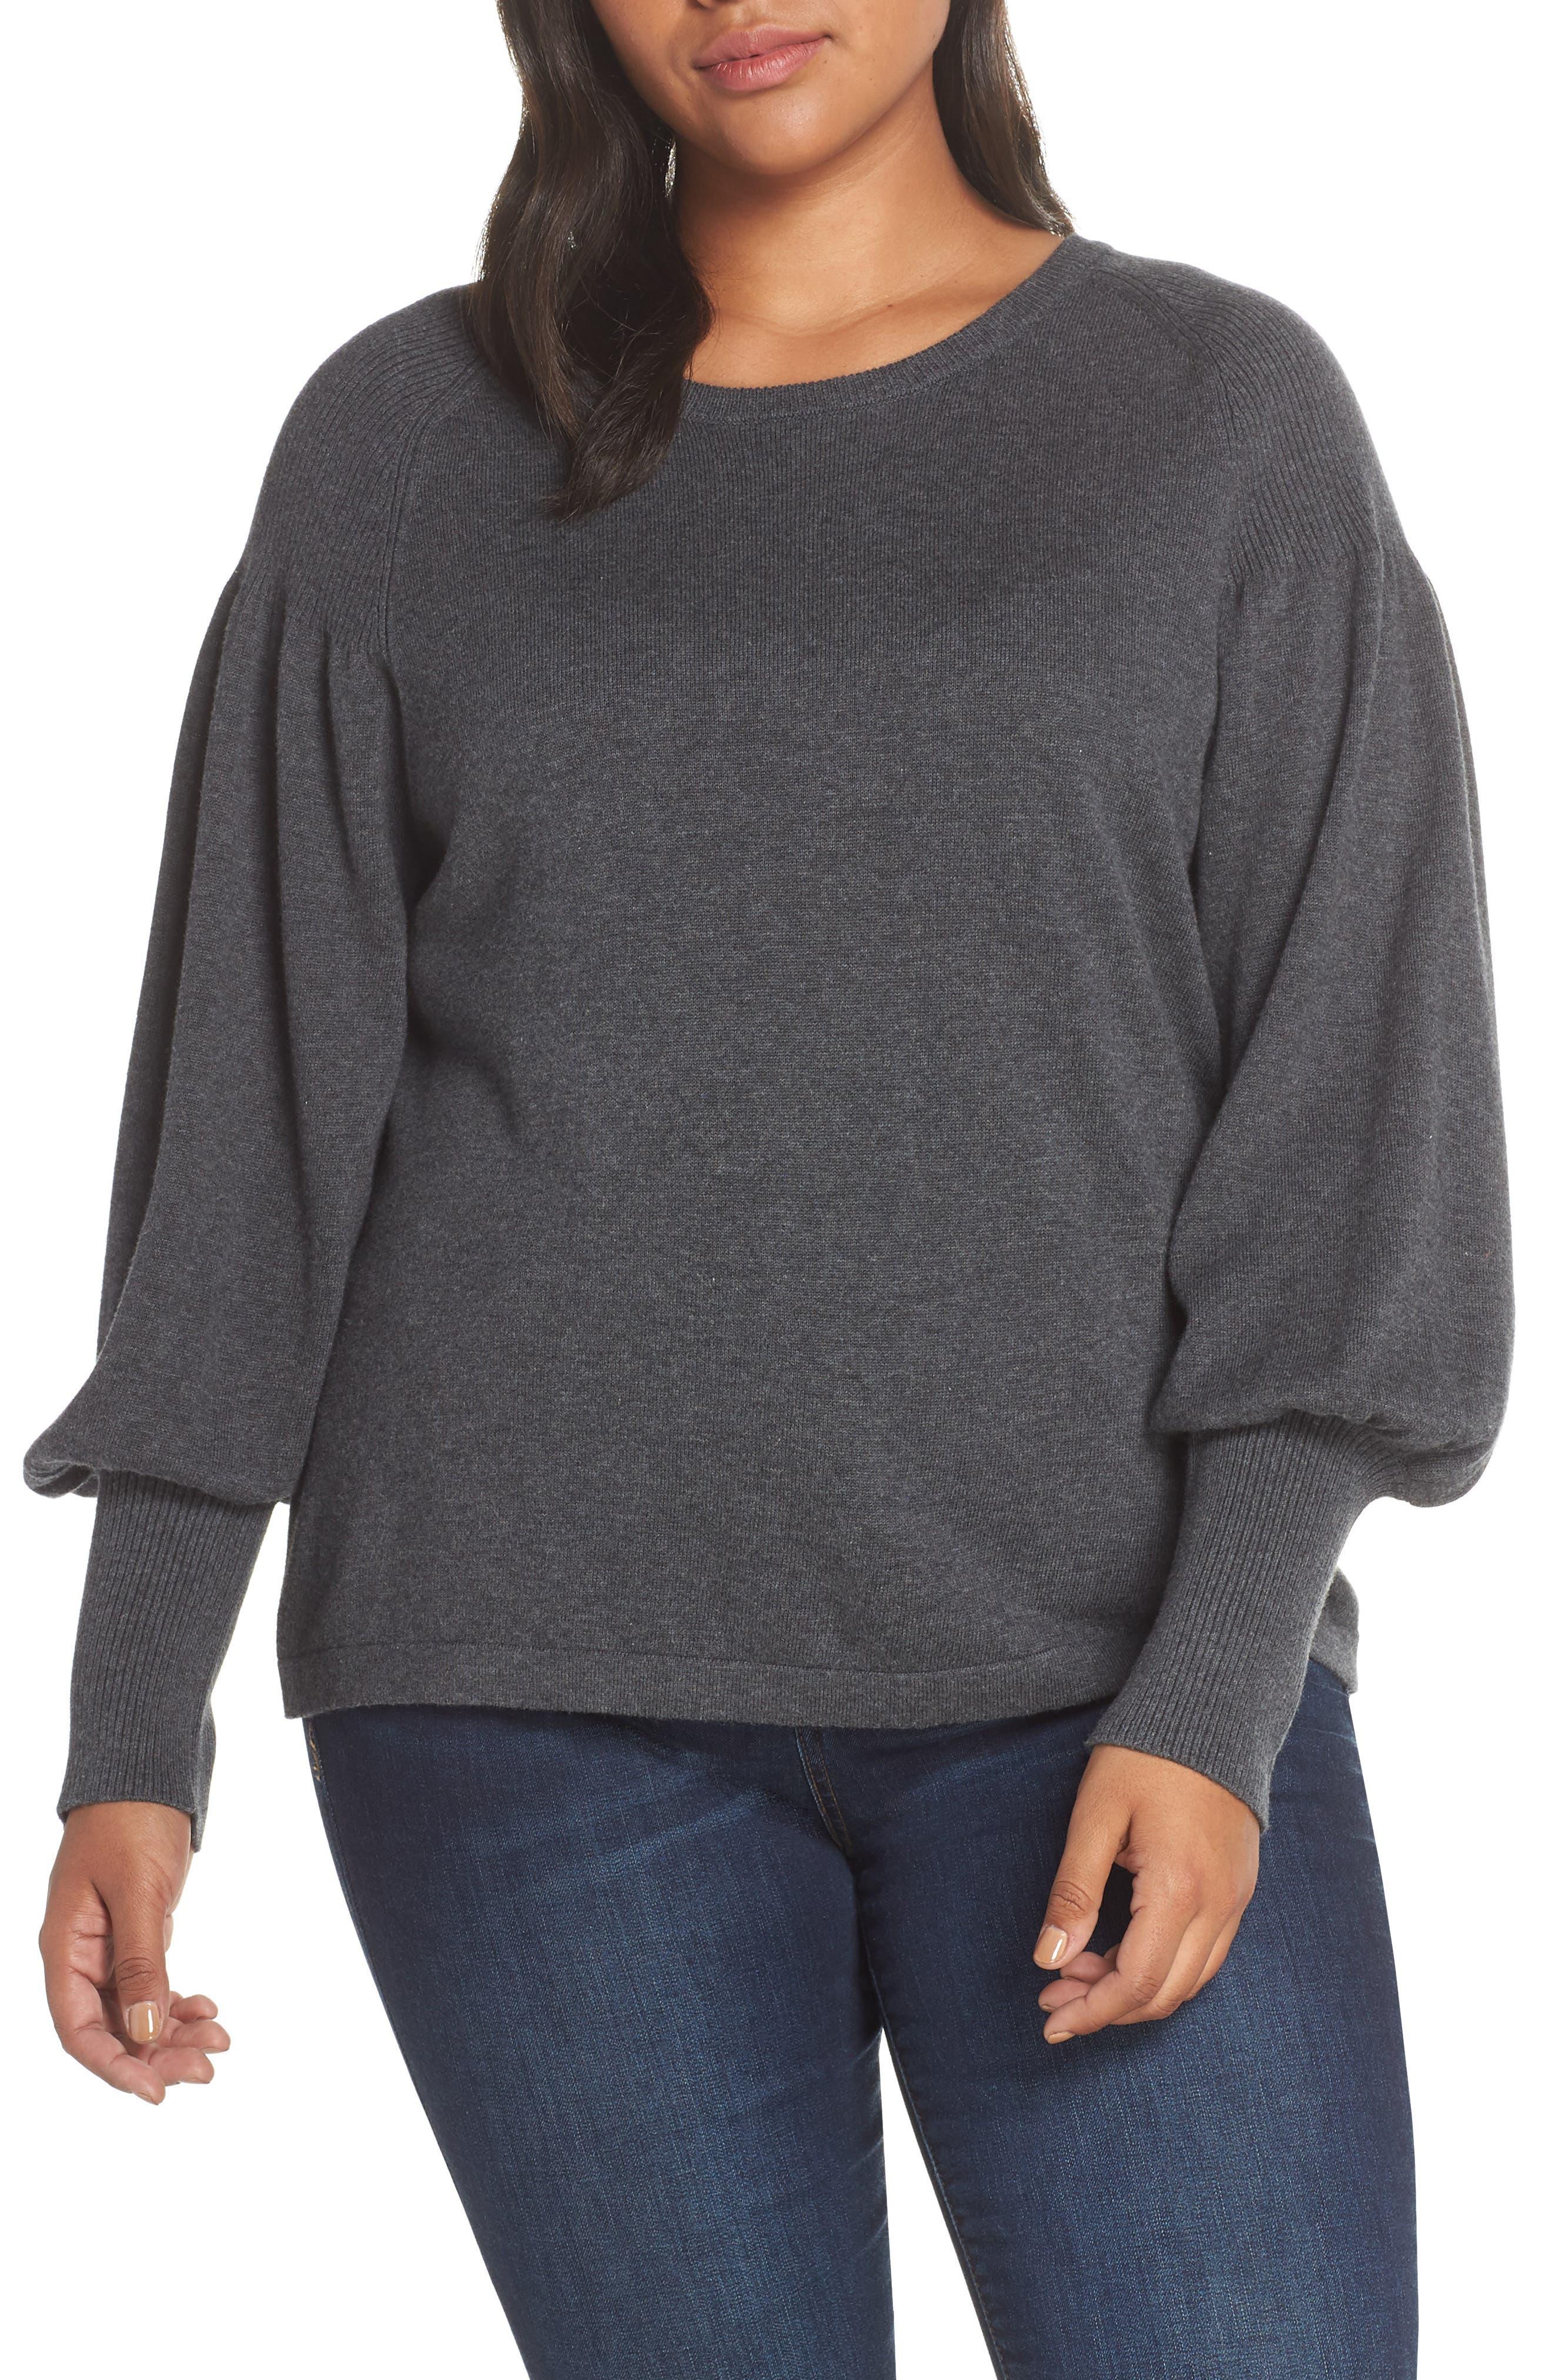 Blouson Sleeve Sweater,                             Alternate thumbnail 2, color,                             MED HEATHER GREY